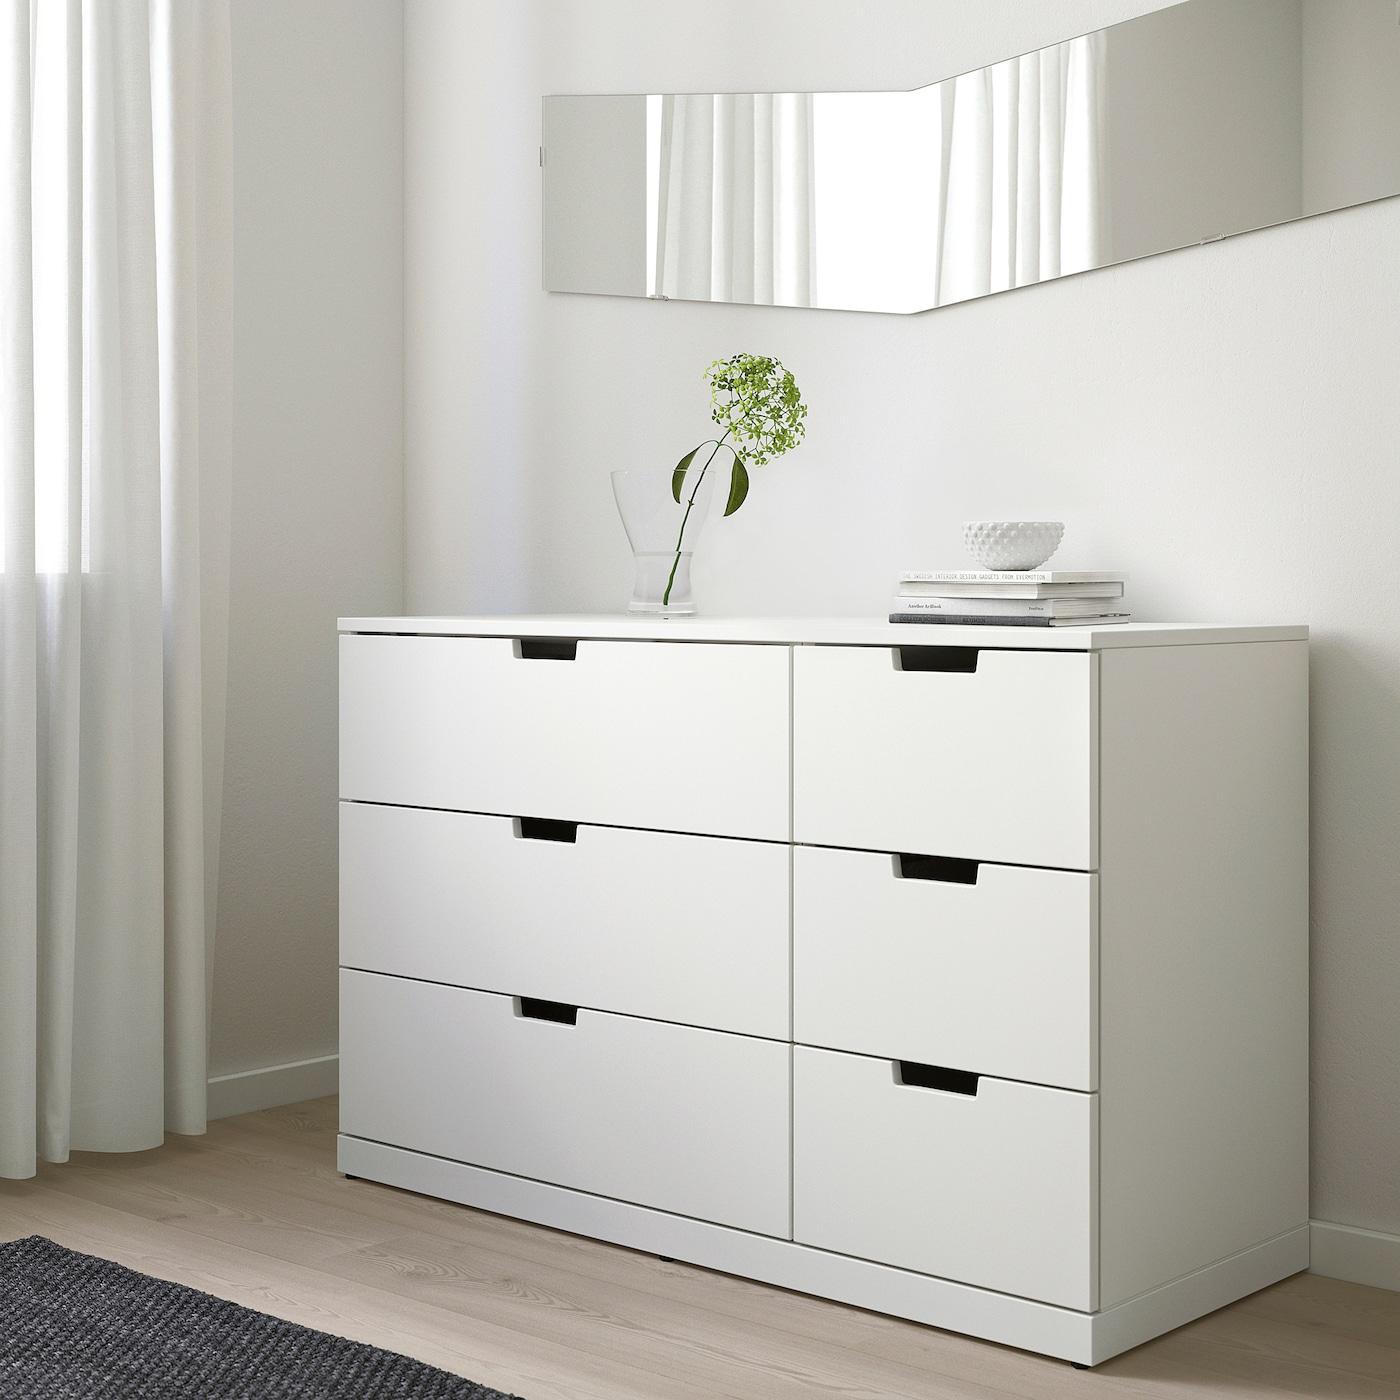 NORDLI Chest of 6 drawers, white, 120x76 cm